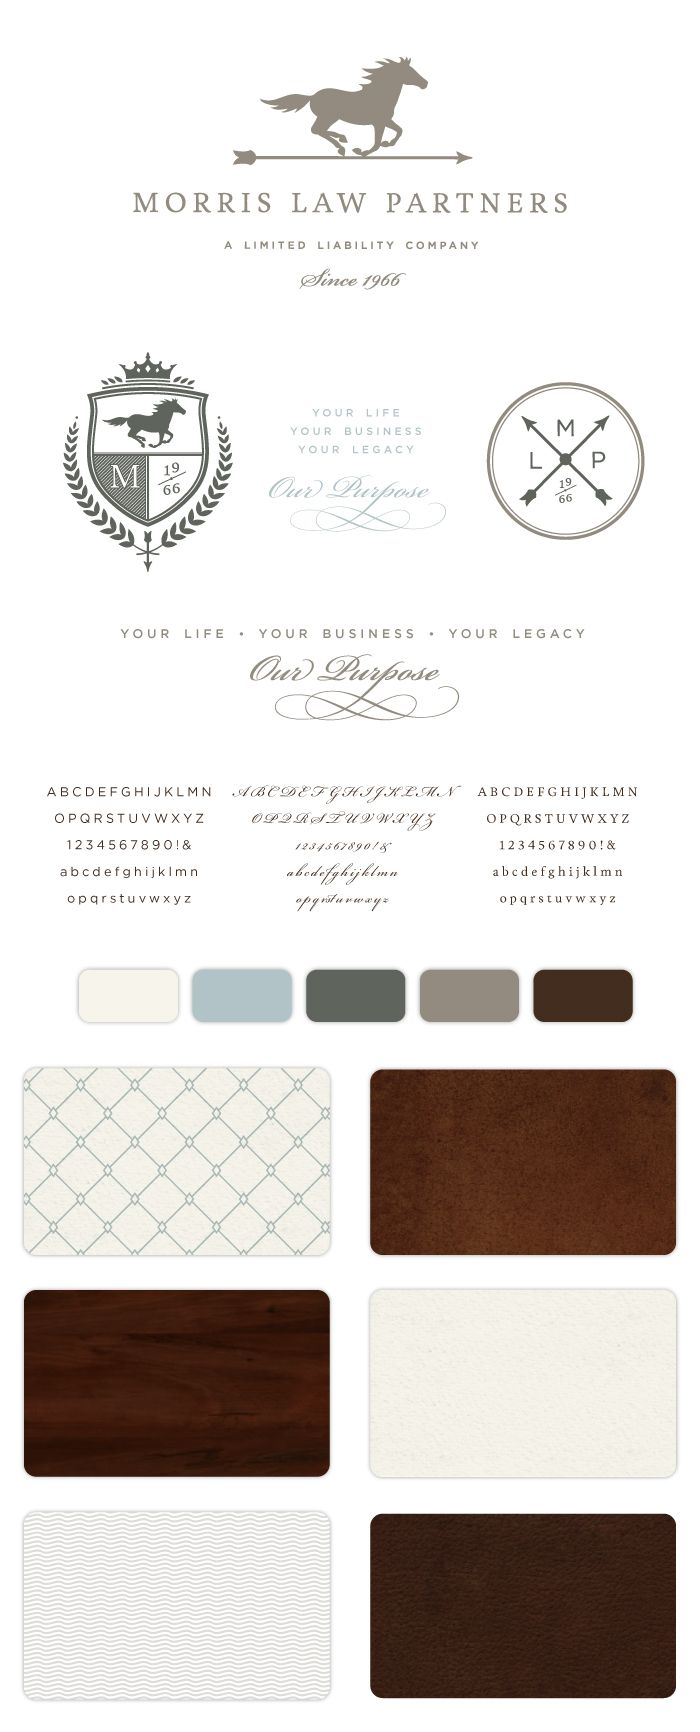 Morris Law Partners, LLC Branding • Braizen Branding & Design